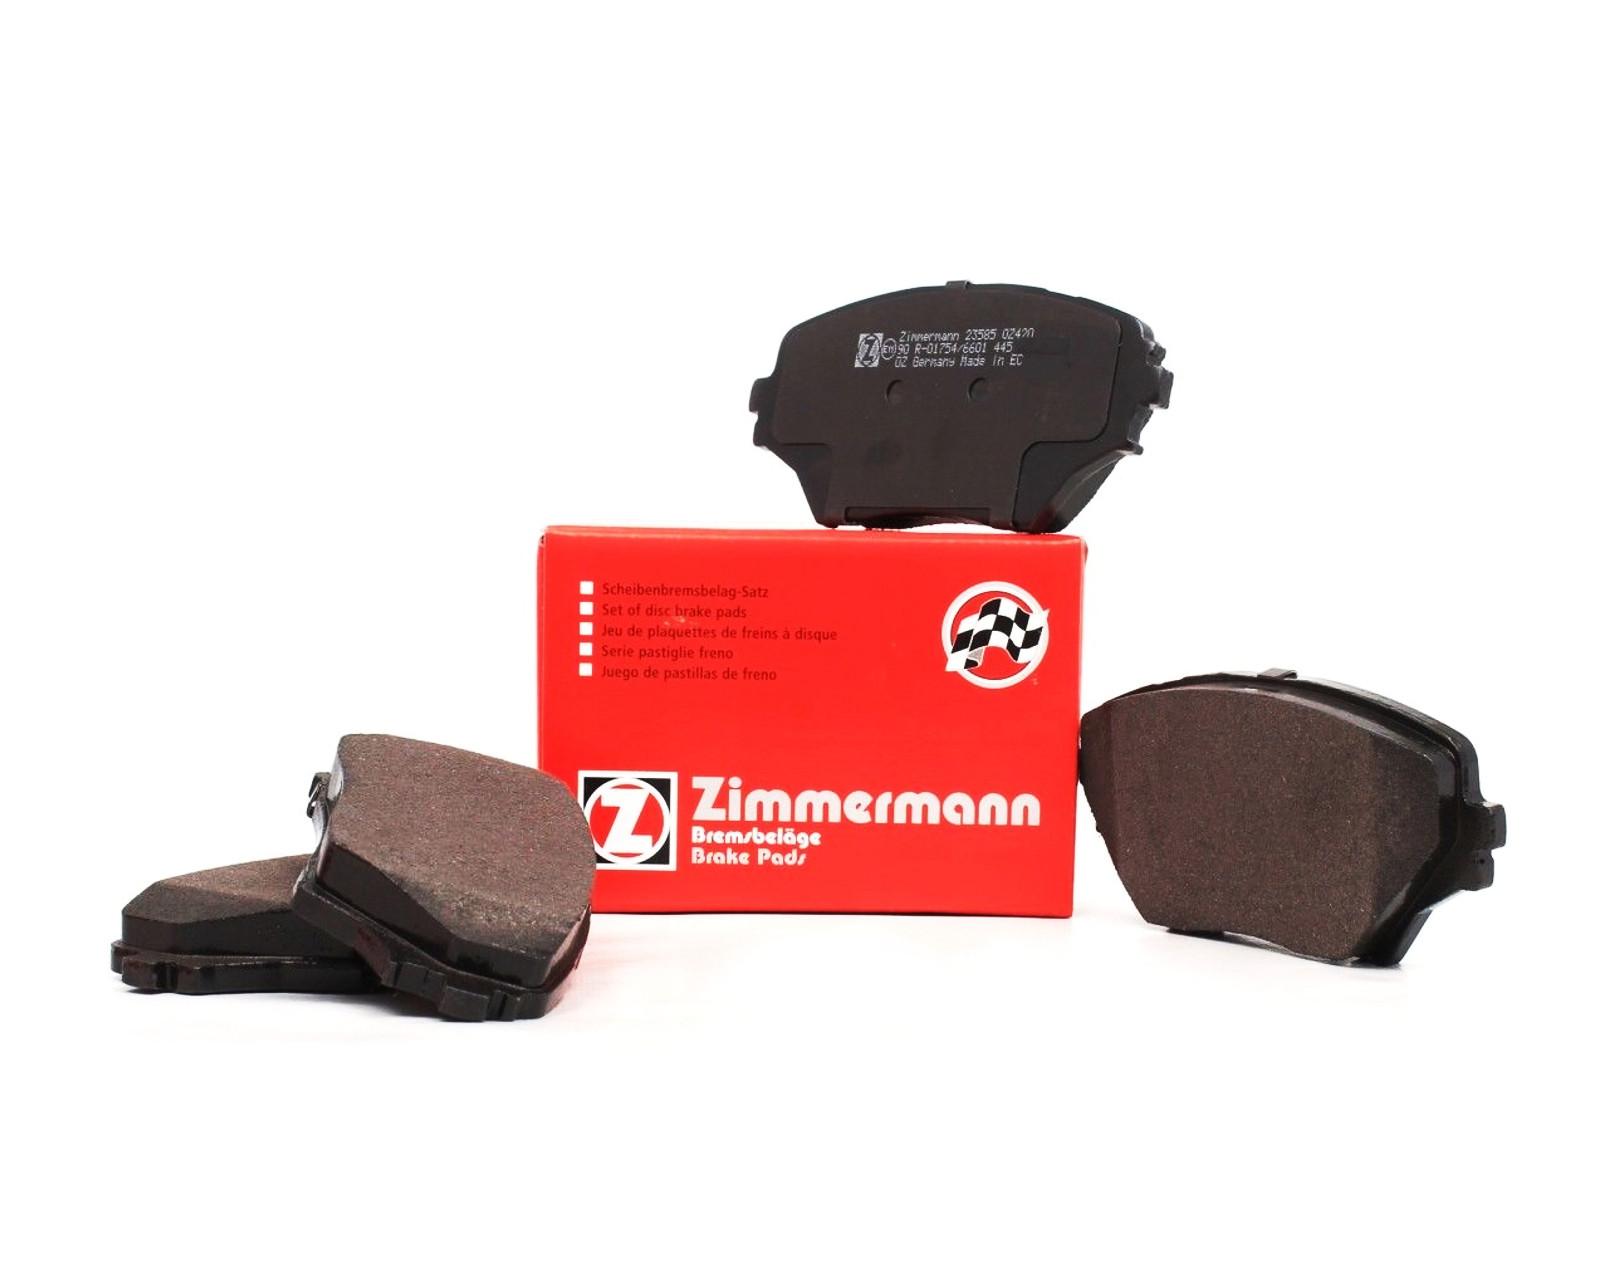 klocki Zimmermann